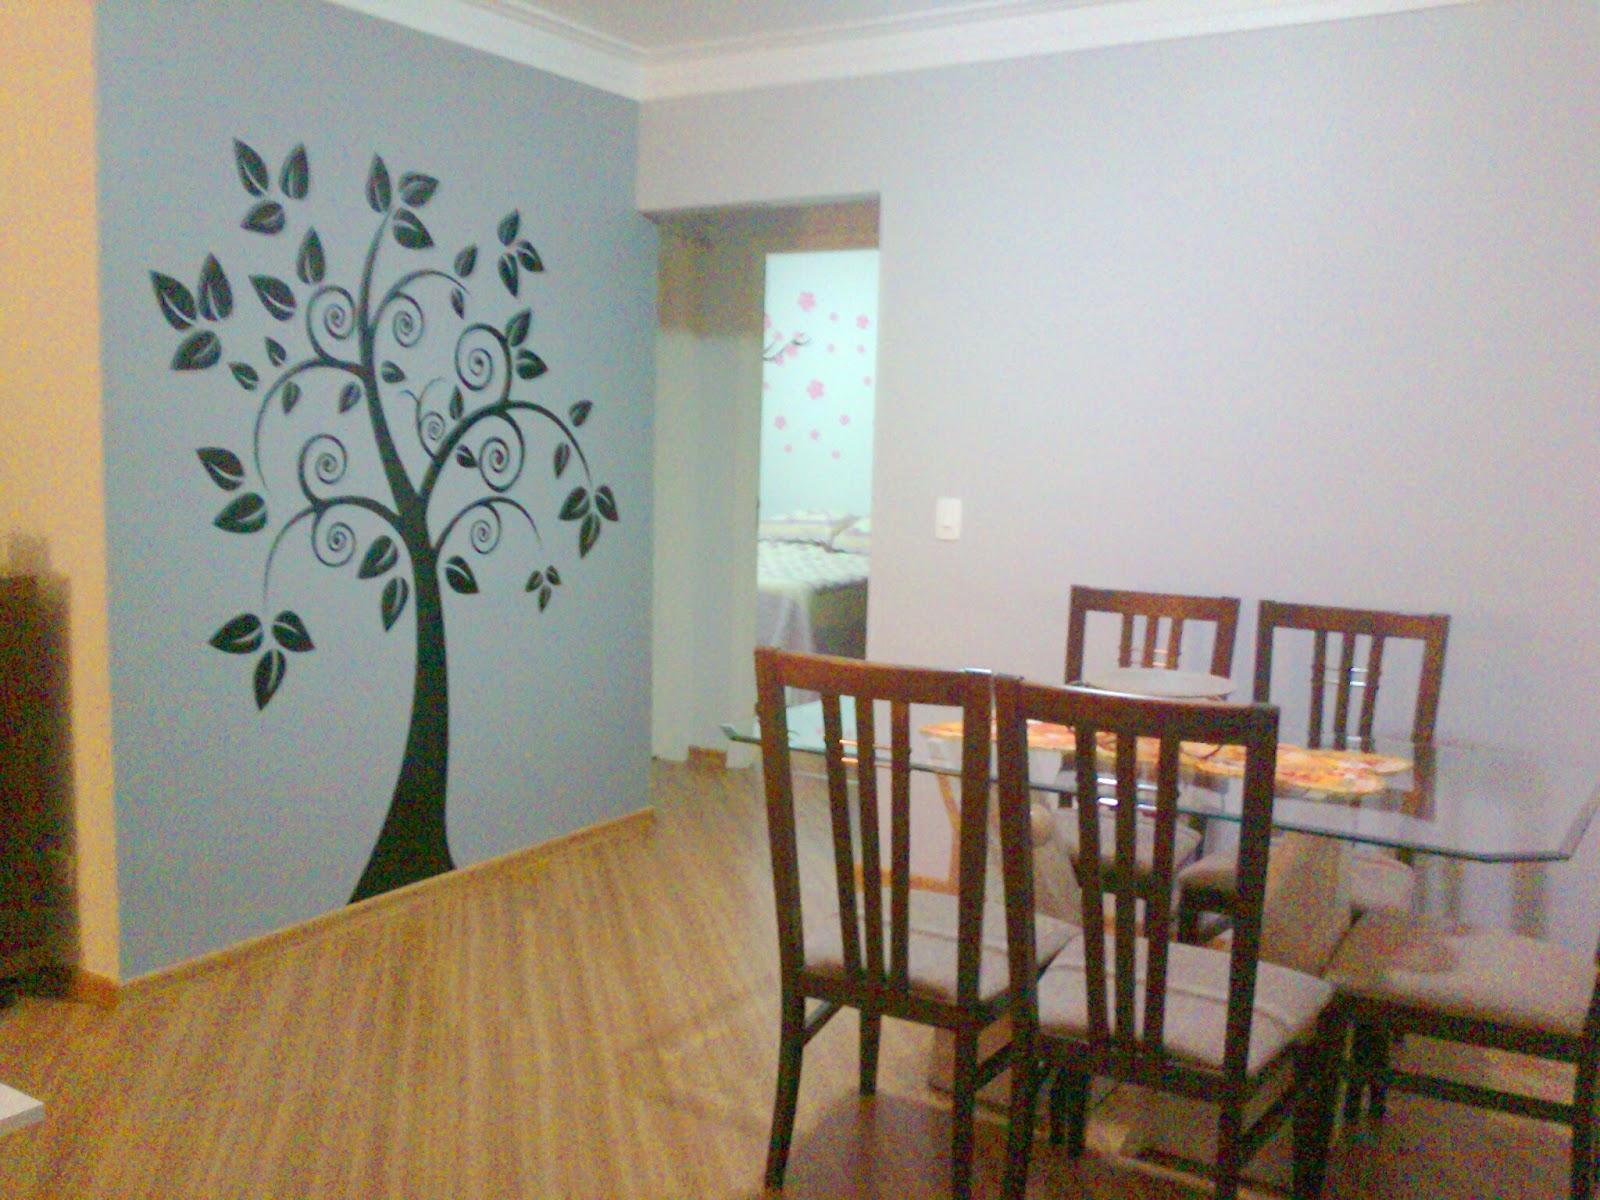 Adesivo Rvore Art Stickers Adesivos Decorativos -> Adesivos Decorativos Para Sala De Jantar